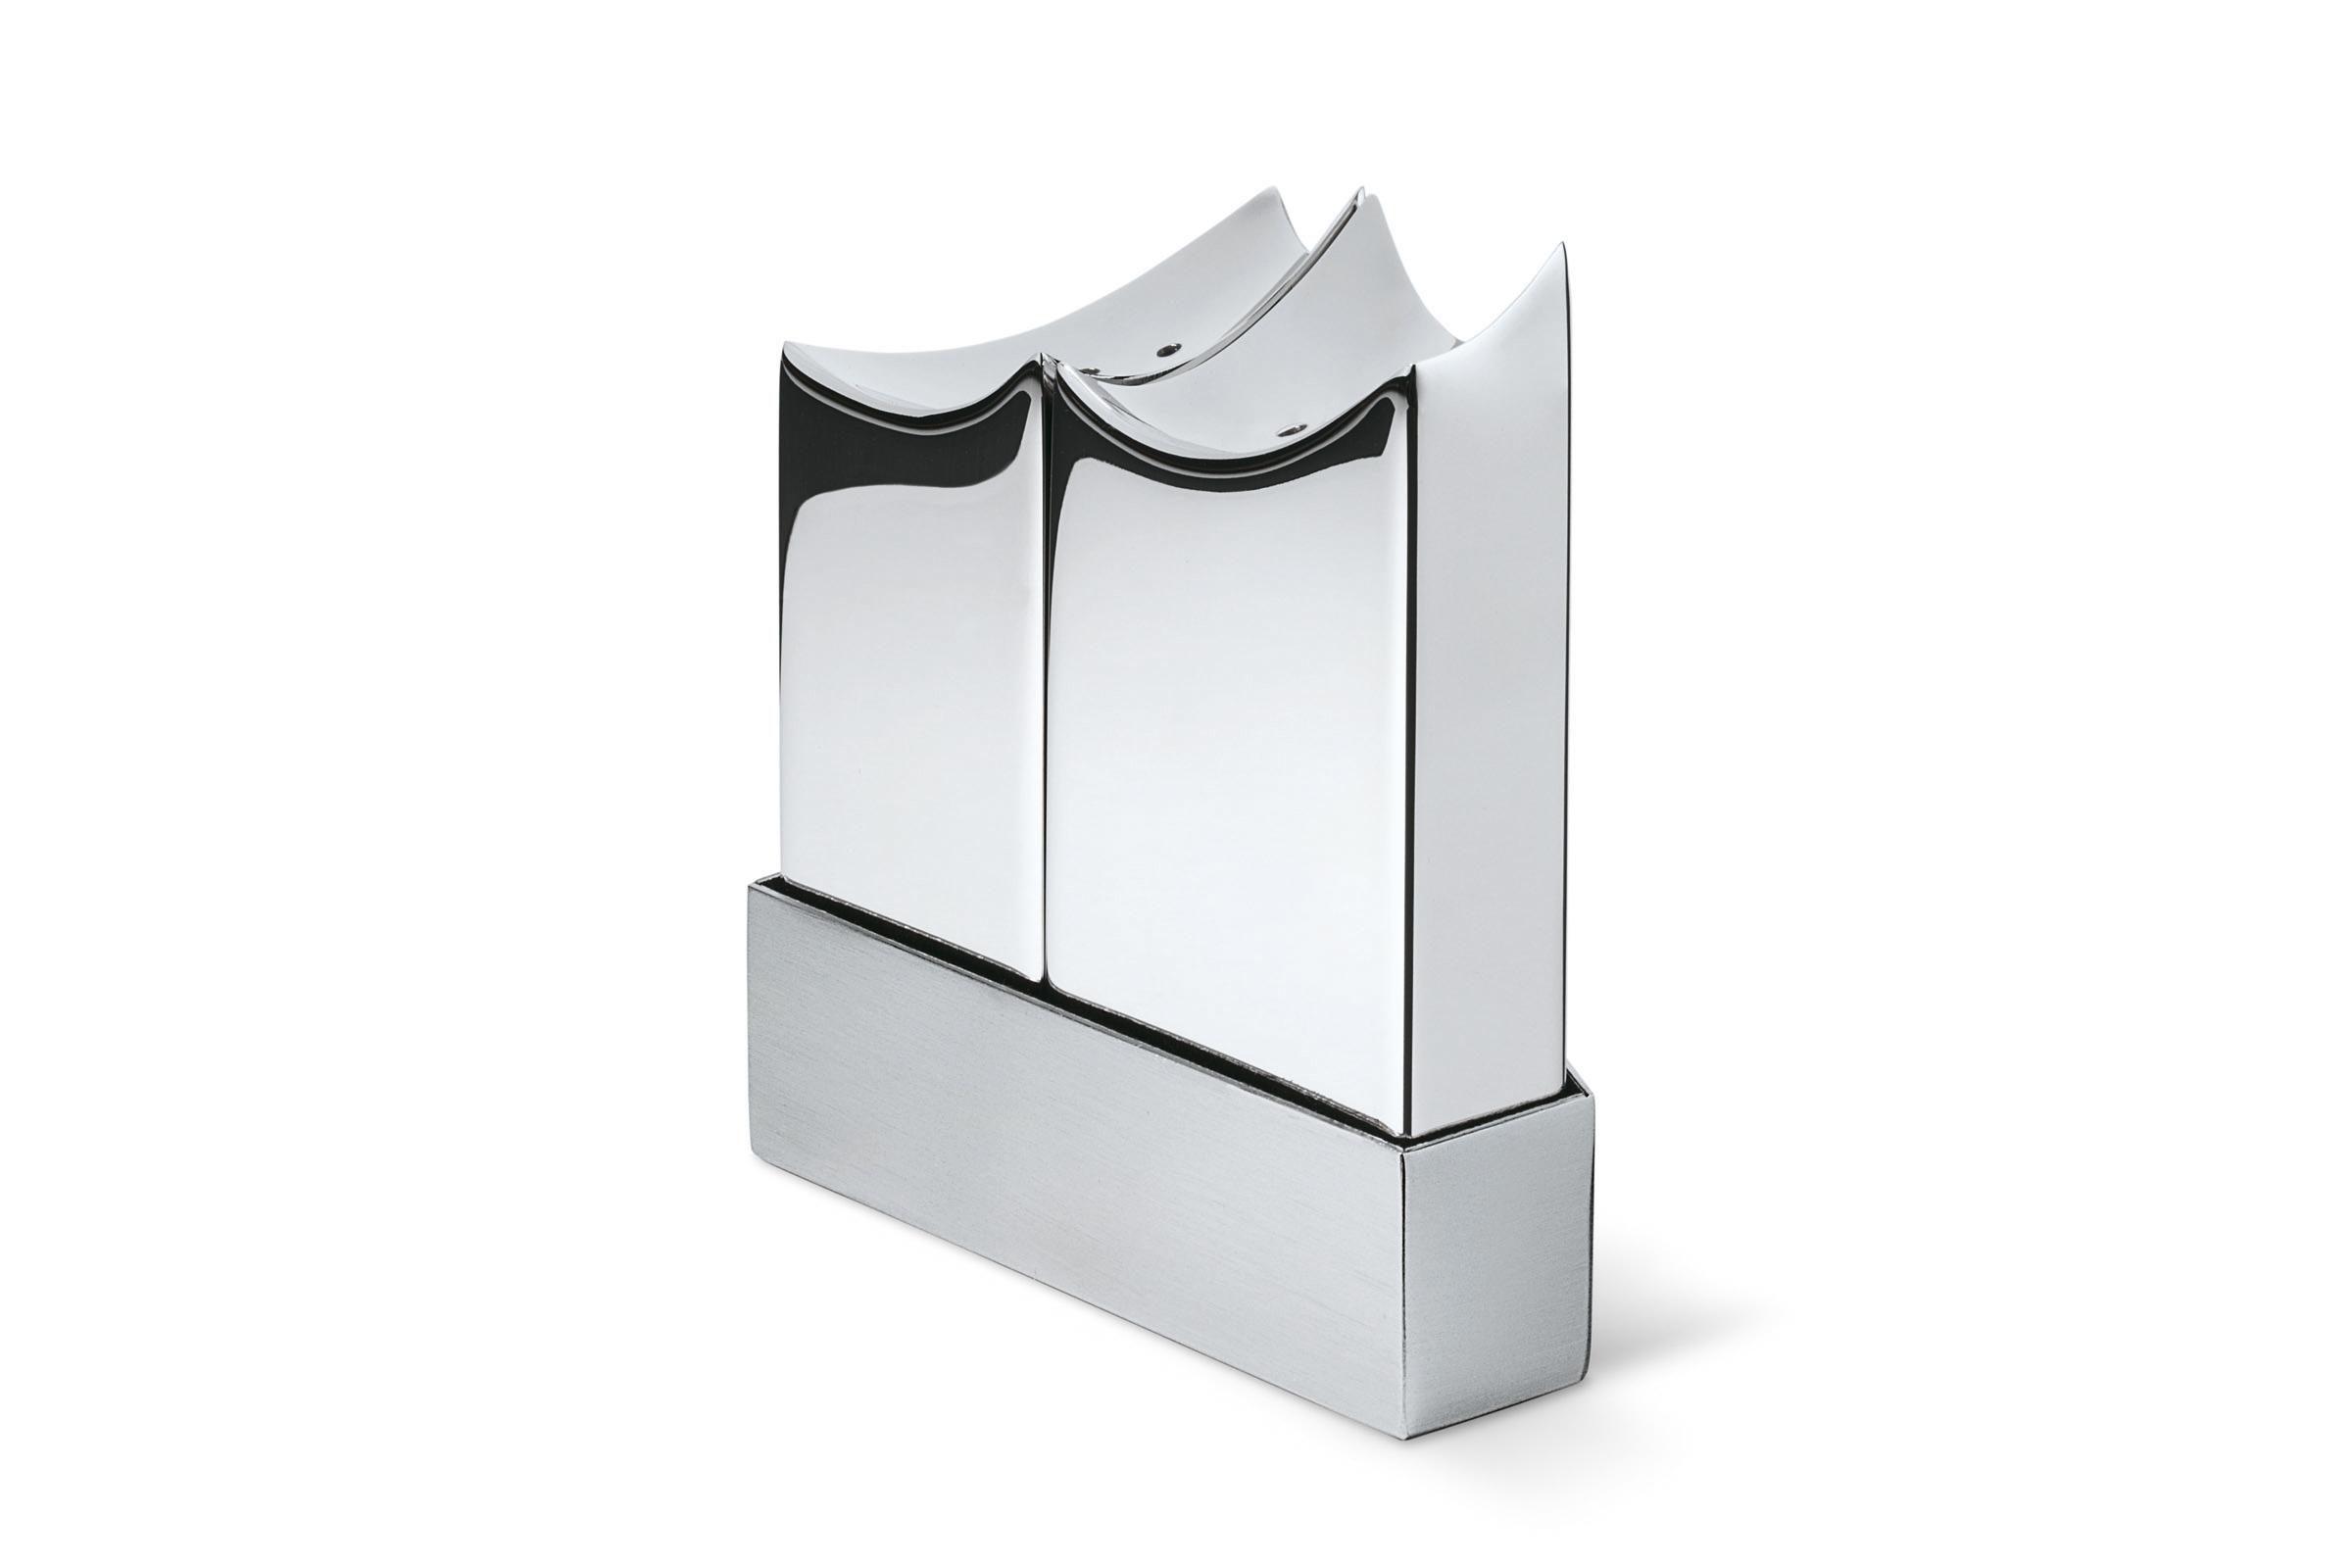 elbharmonie salz pfefferstreuer table shop philippi. Black Bedroom Furniture Sets. Home Design Ideas